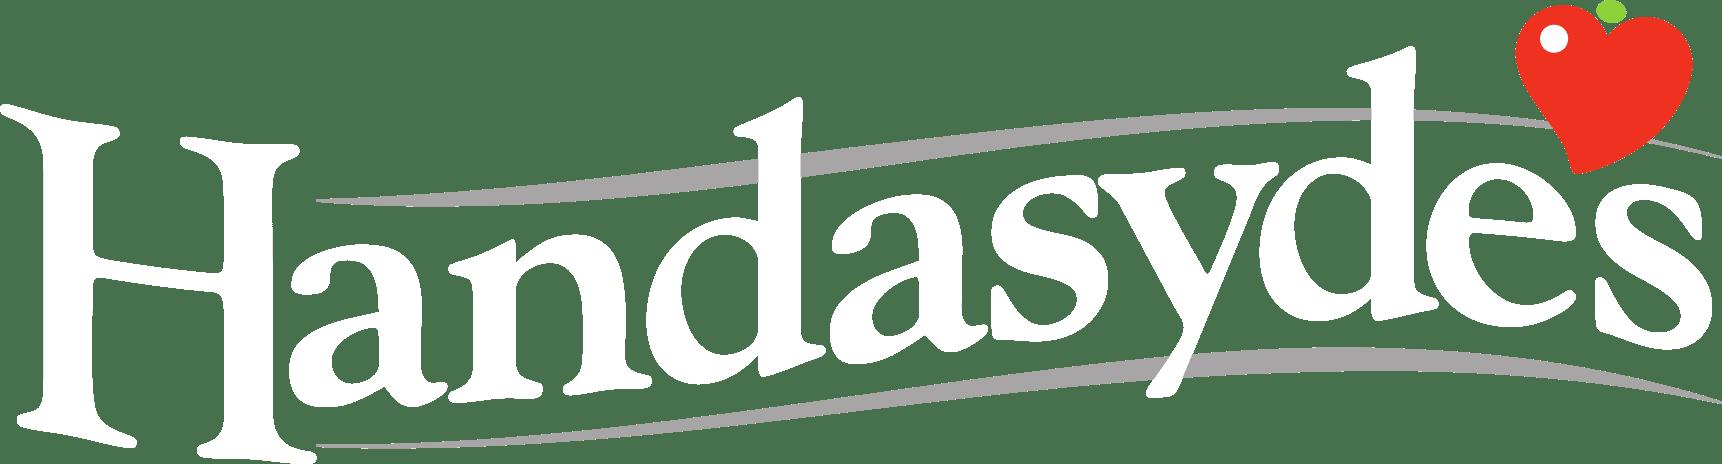 Handasydes White Text logo